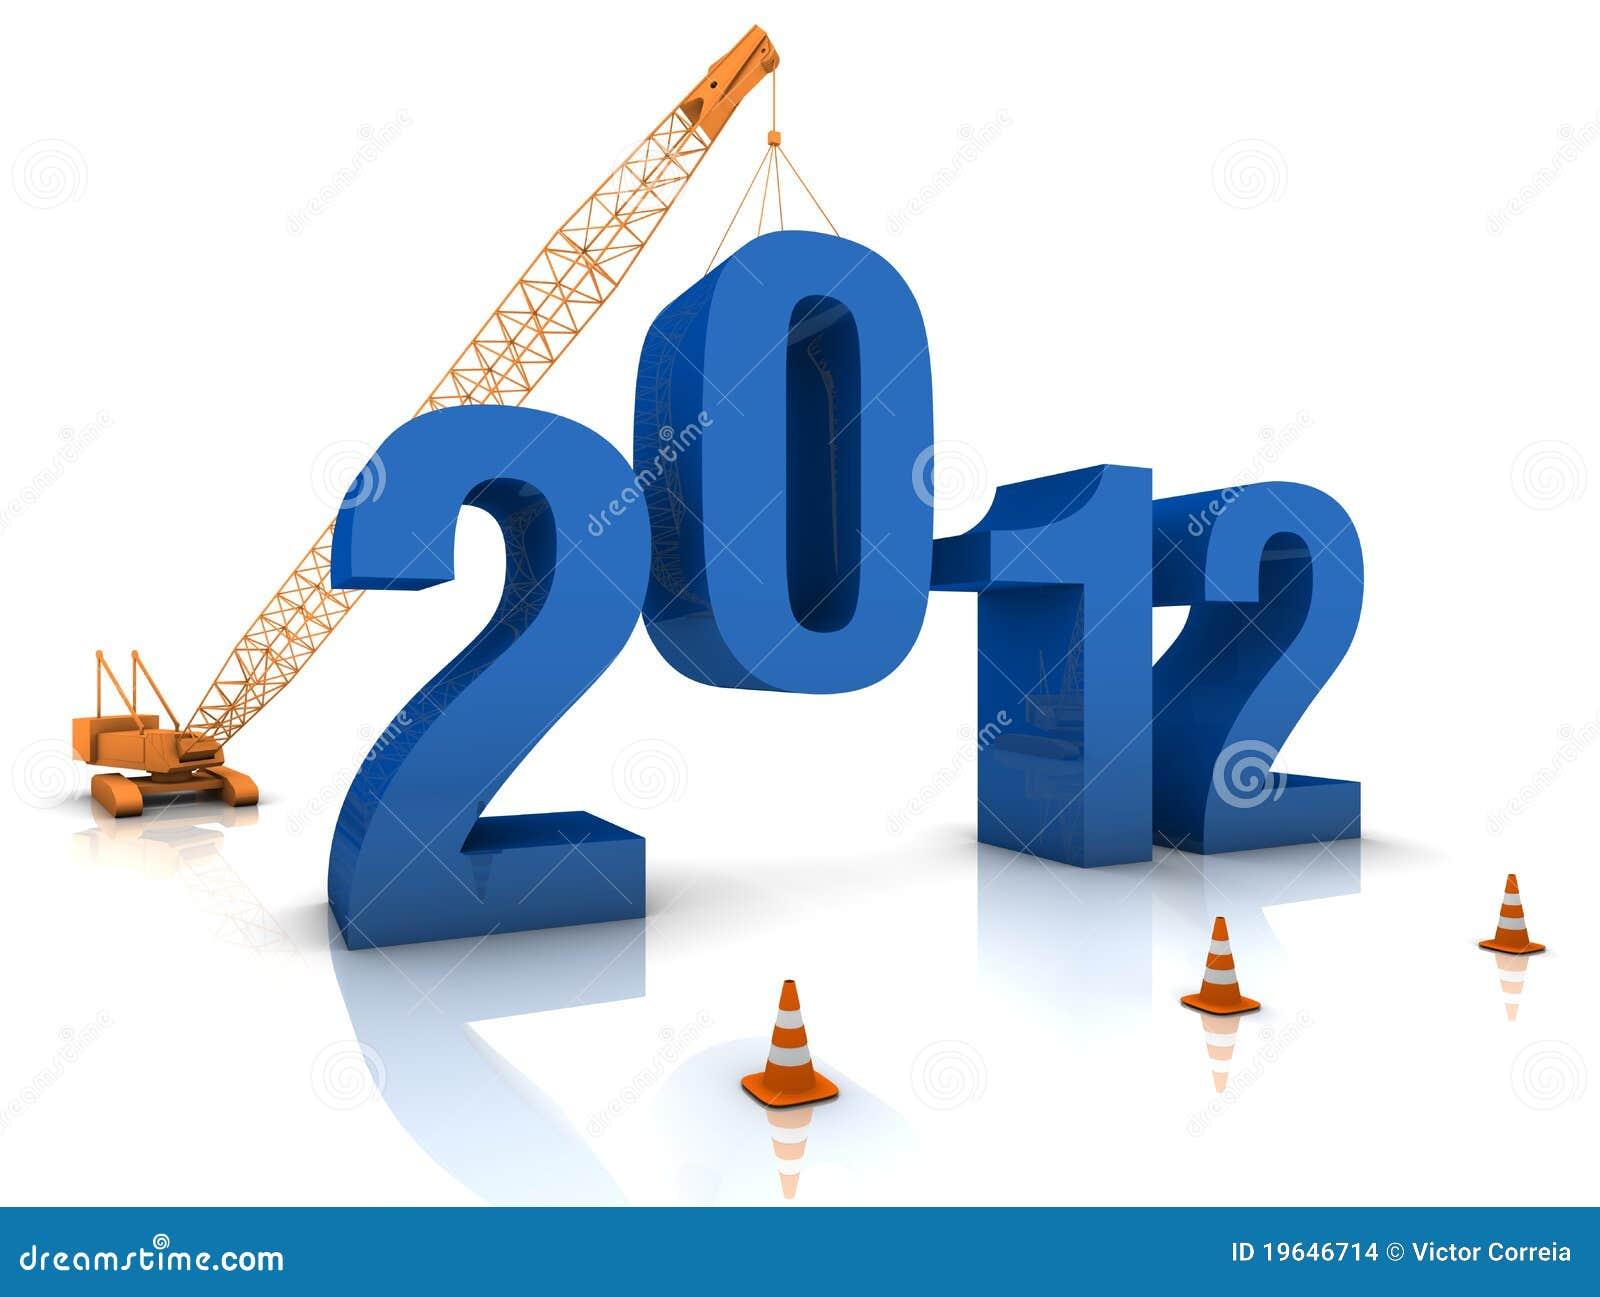 Preparing for 2012